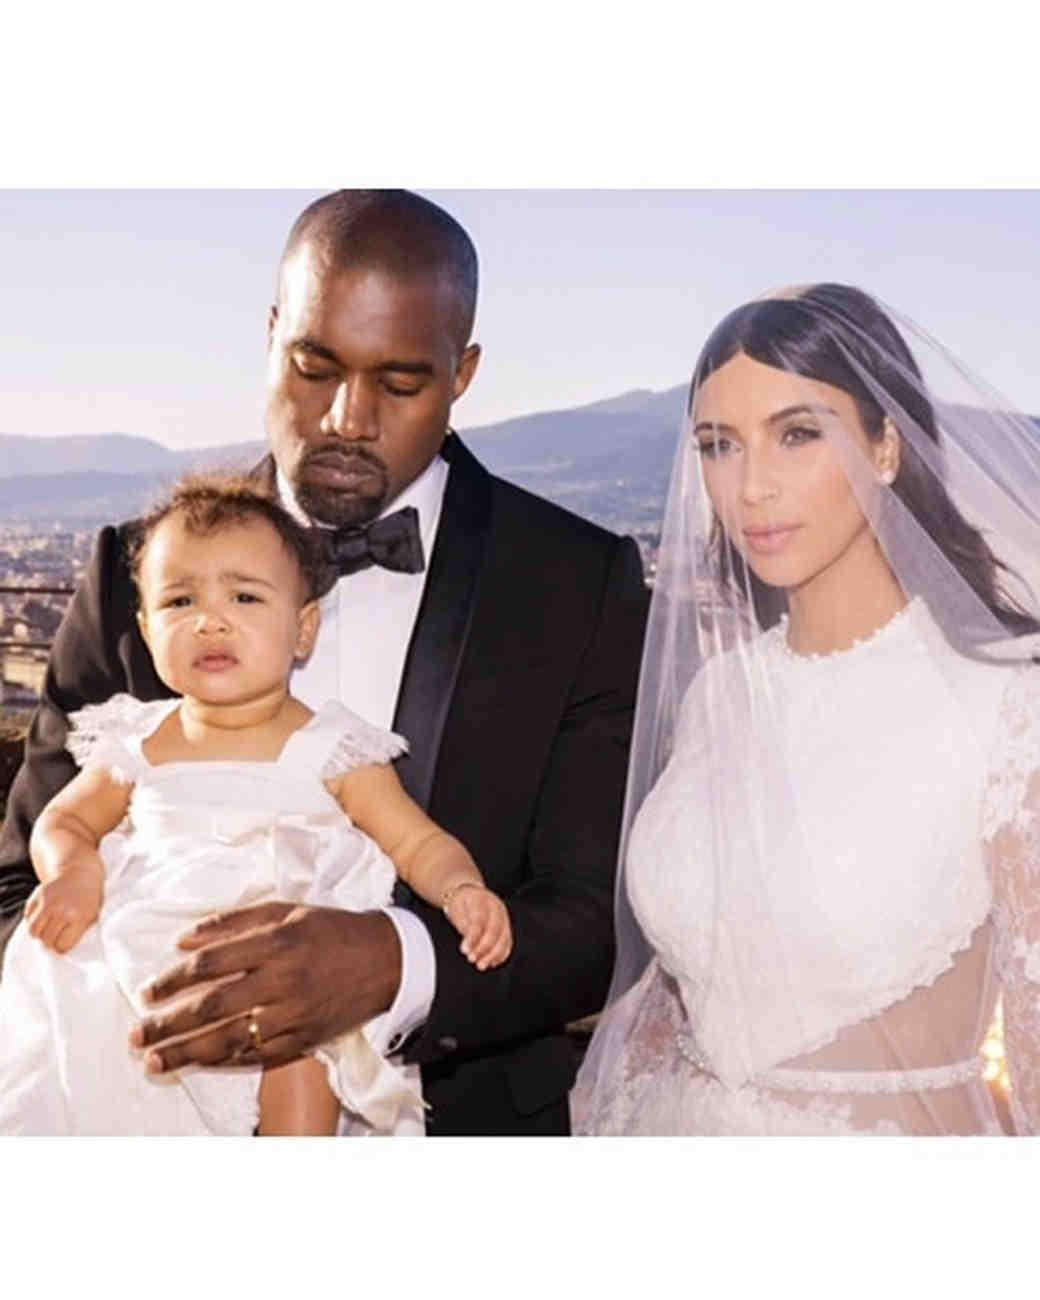 kim-kardashian-kanye-west-wedding-north-0516.jpg